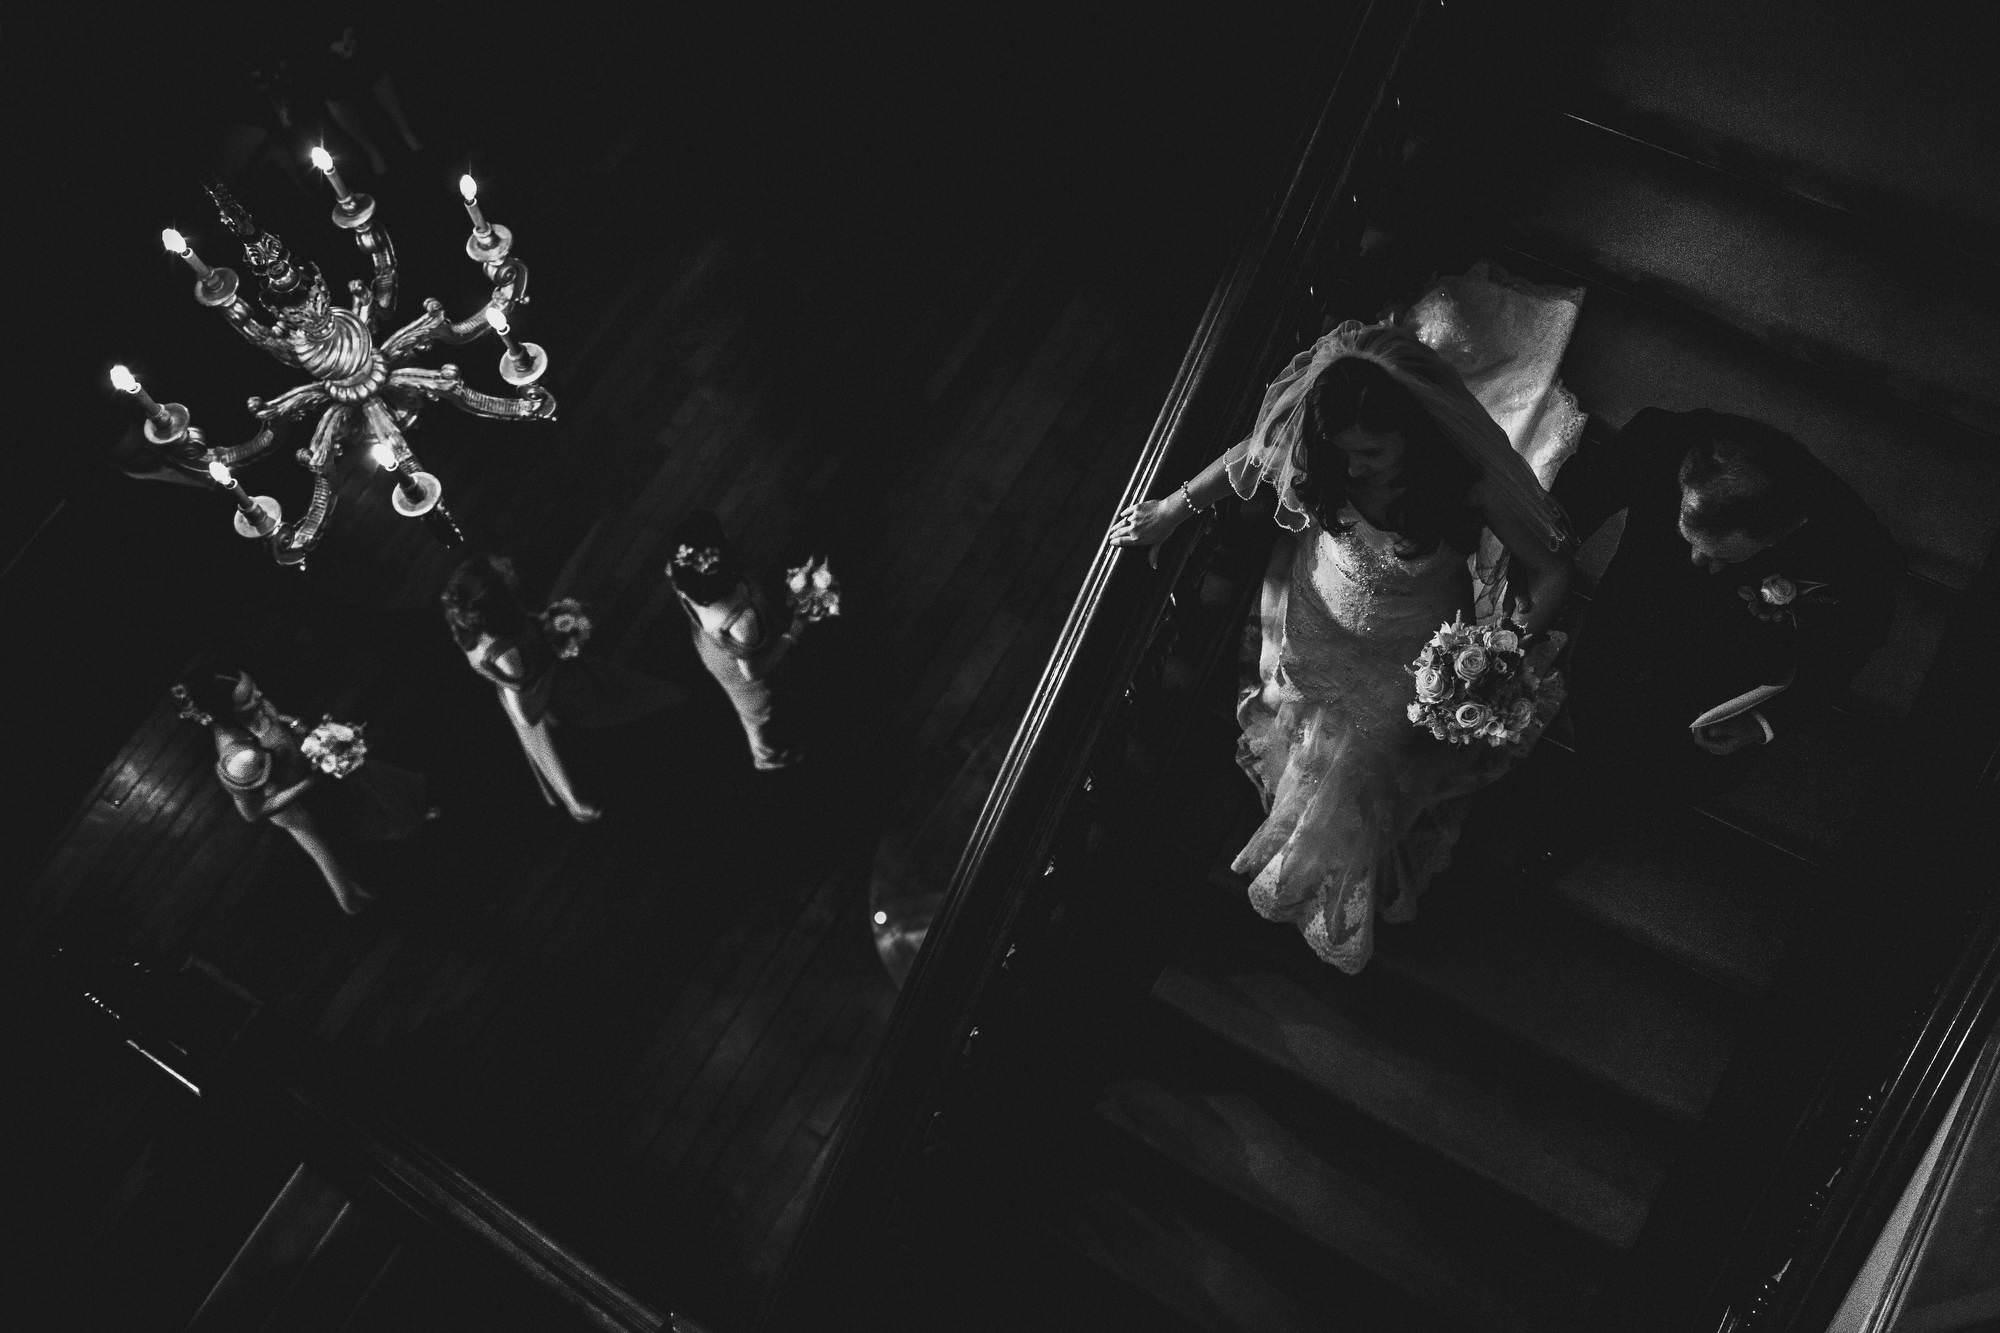 Cheshire wedding photography UK - Arley Hall